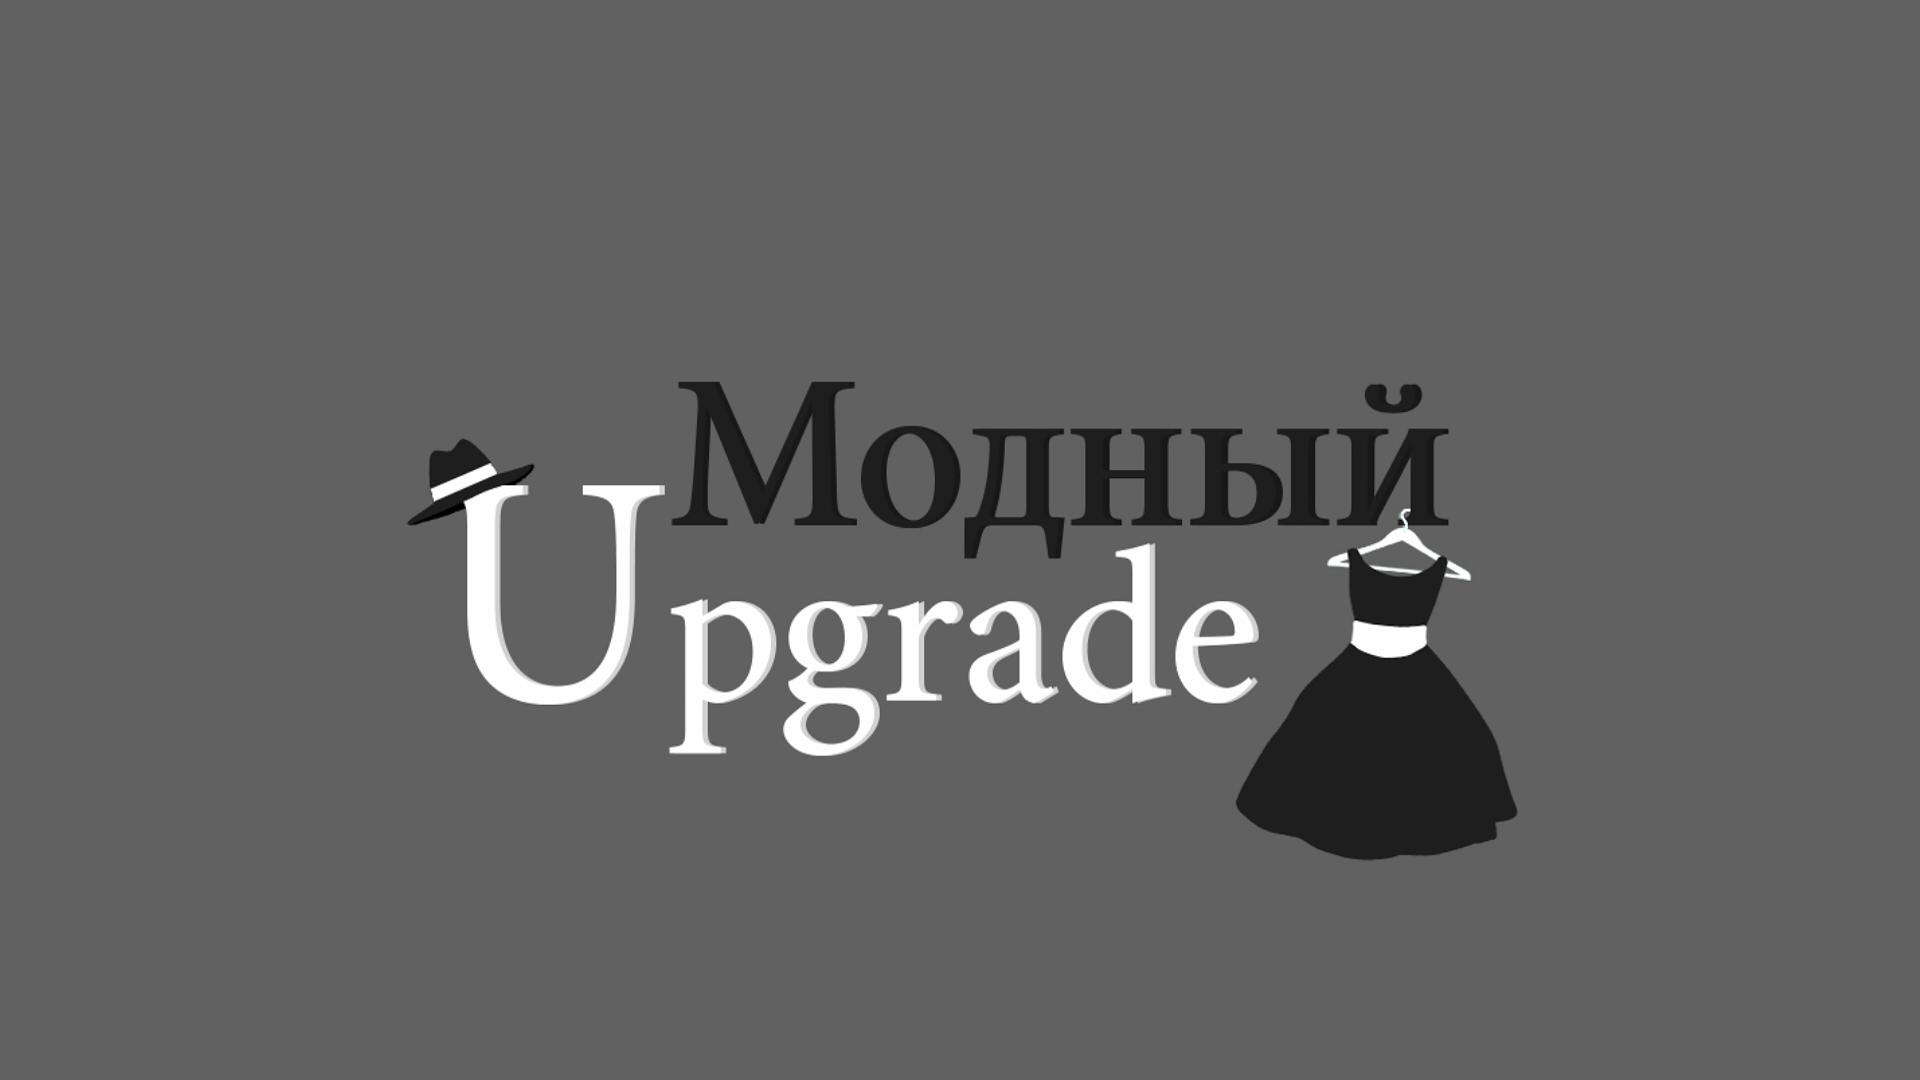 "Логотип интернет магазина ""Модный UPGRADE"" фото f_818594642b4a9158.jpg"